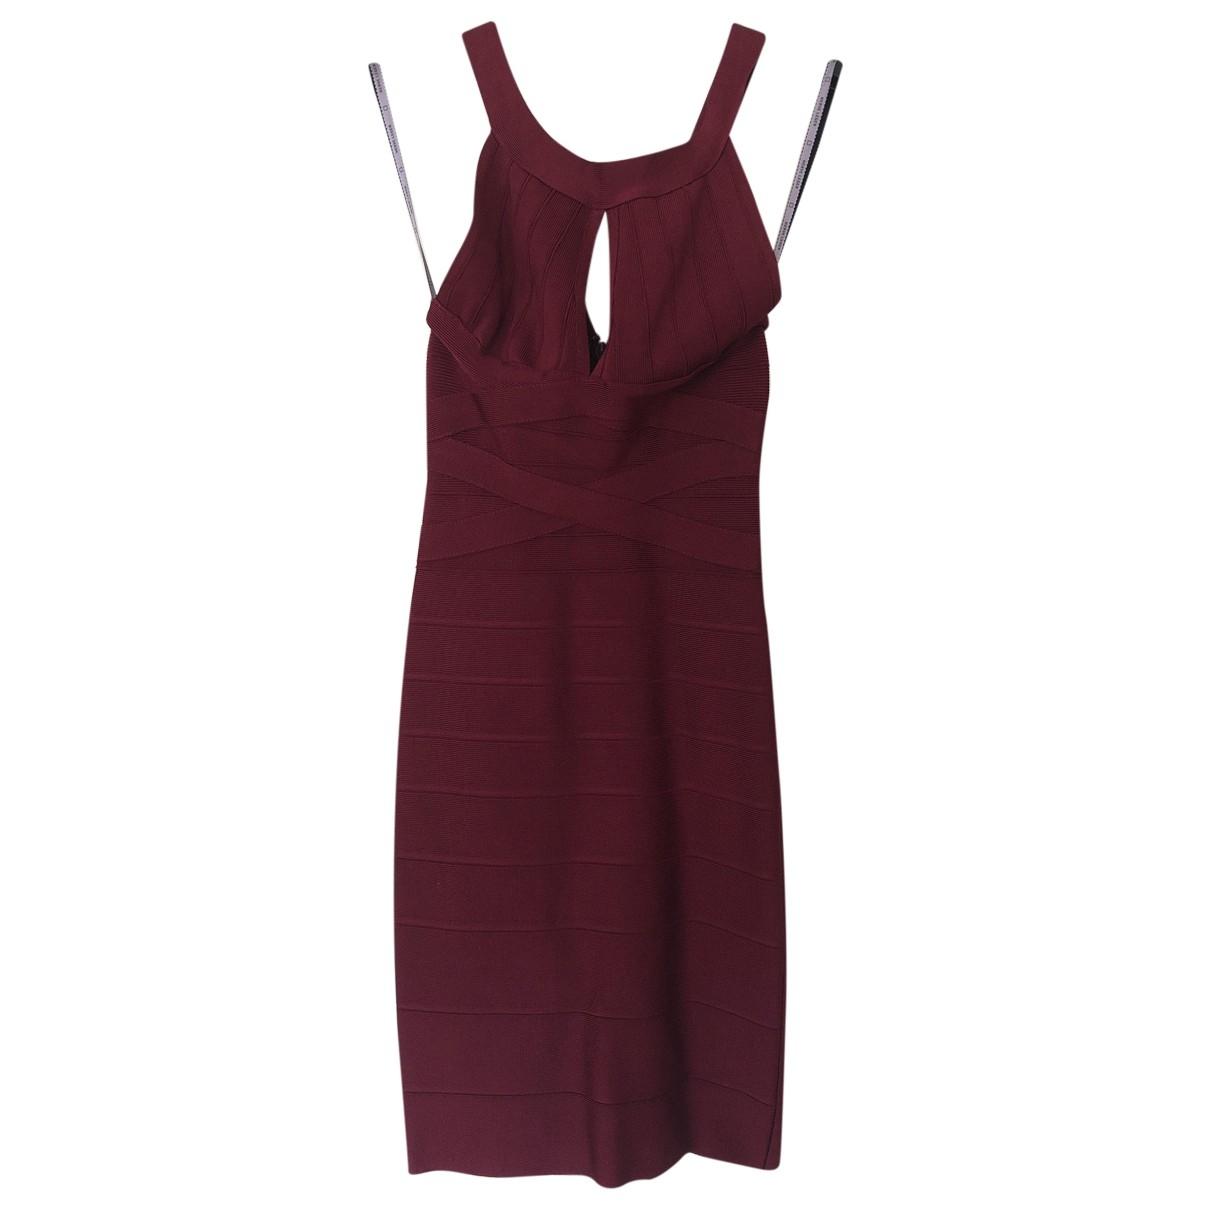 Herve Leger \N Burgundy dress for Women XXS International